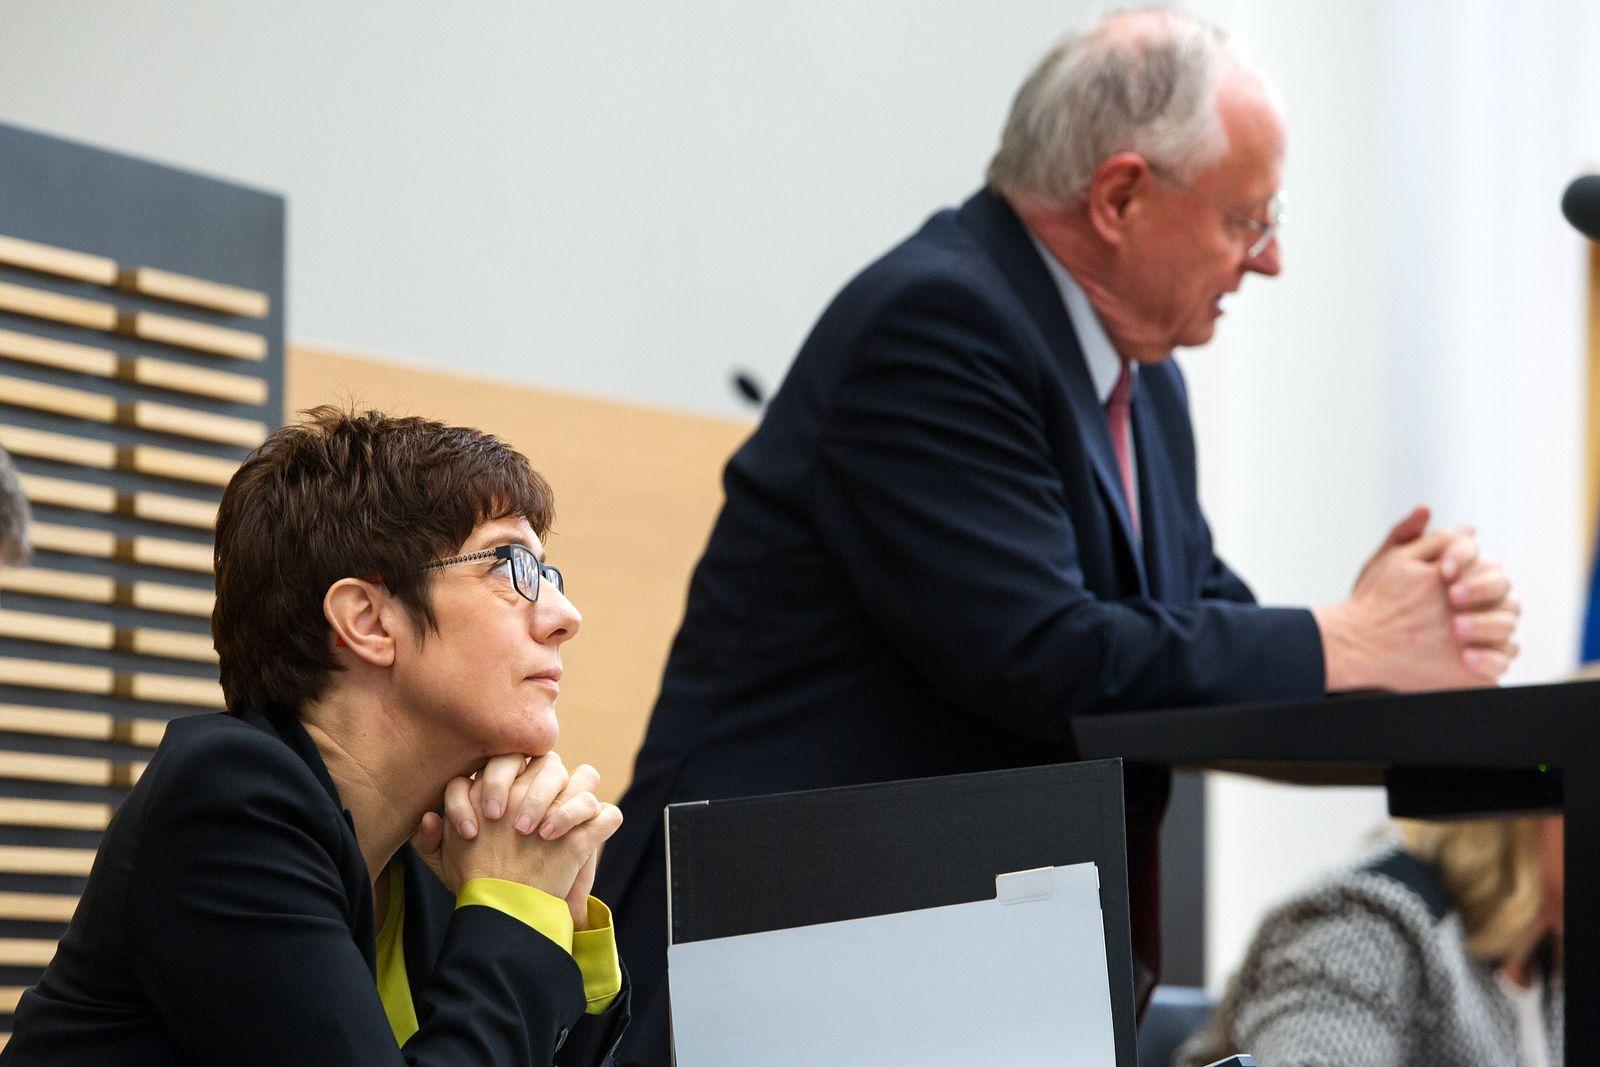 Lafontaine Kramp-Karrenbauer